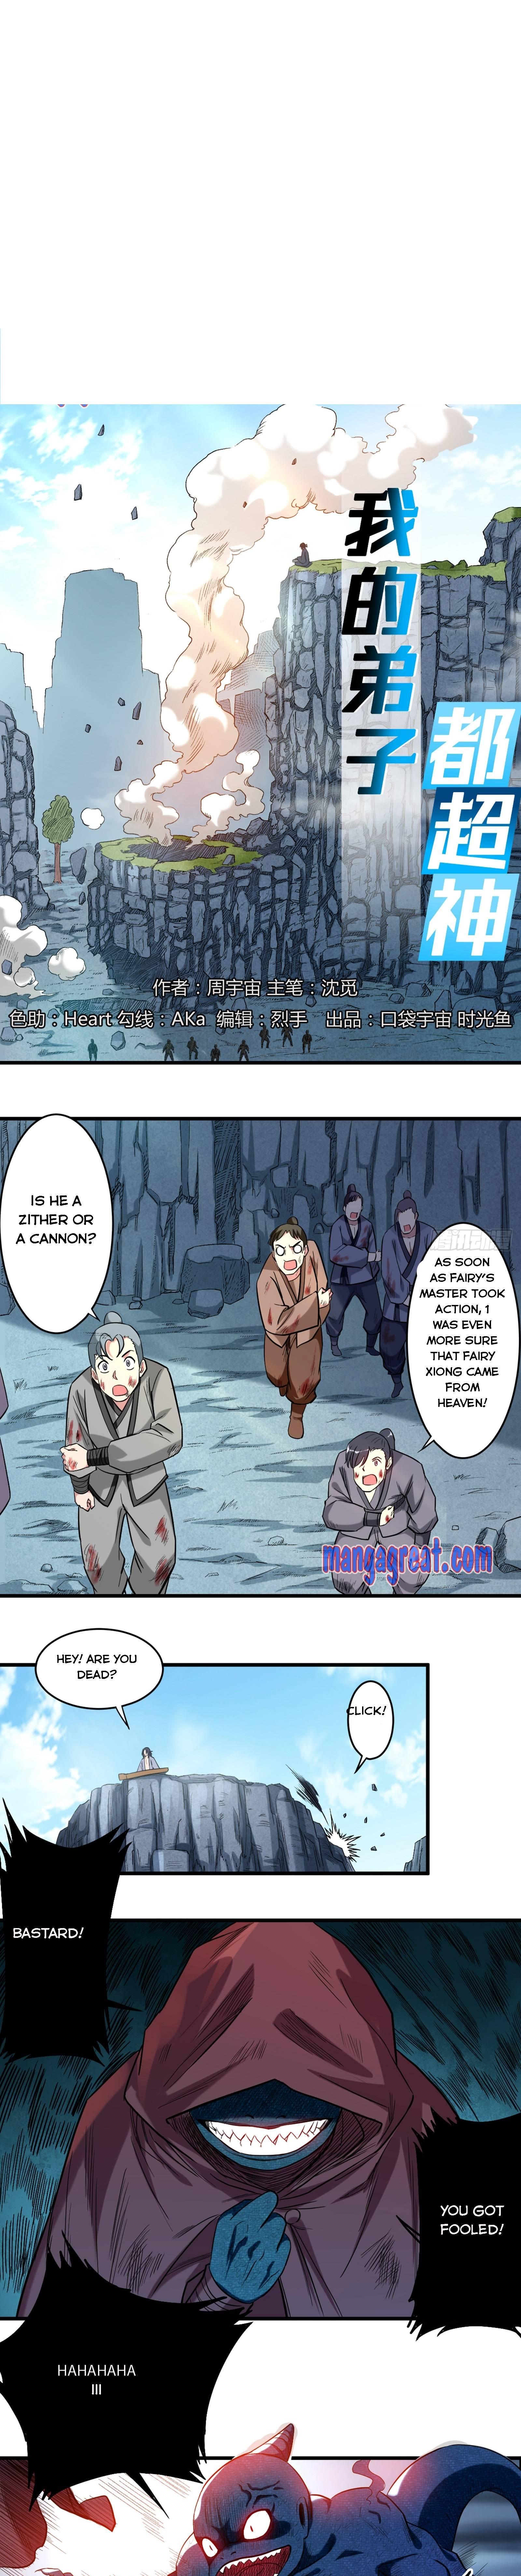 https://manga.mangadogs.com/comics/pic4/4/45572/2944571/e2fac3e1bc0f1da2066ee2d0041bdfc9.jpg Page 1